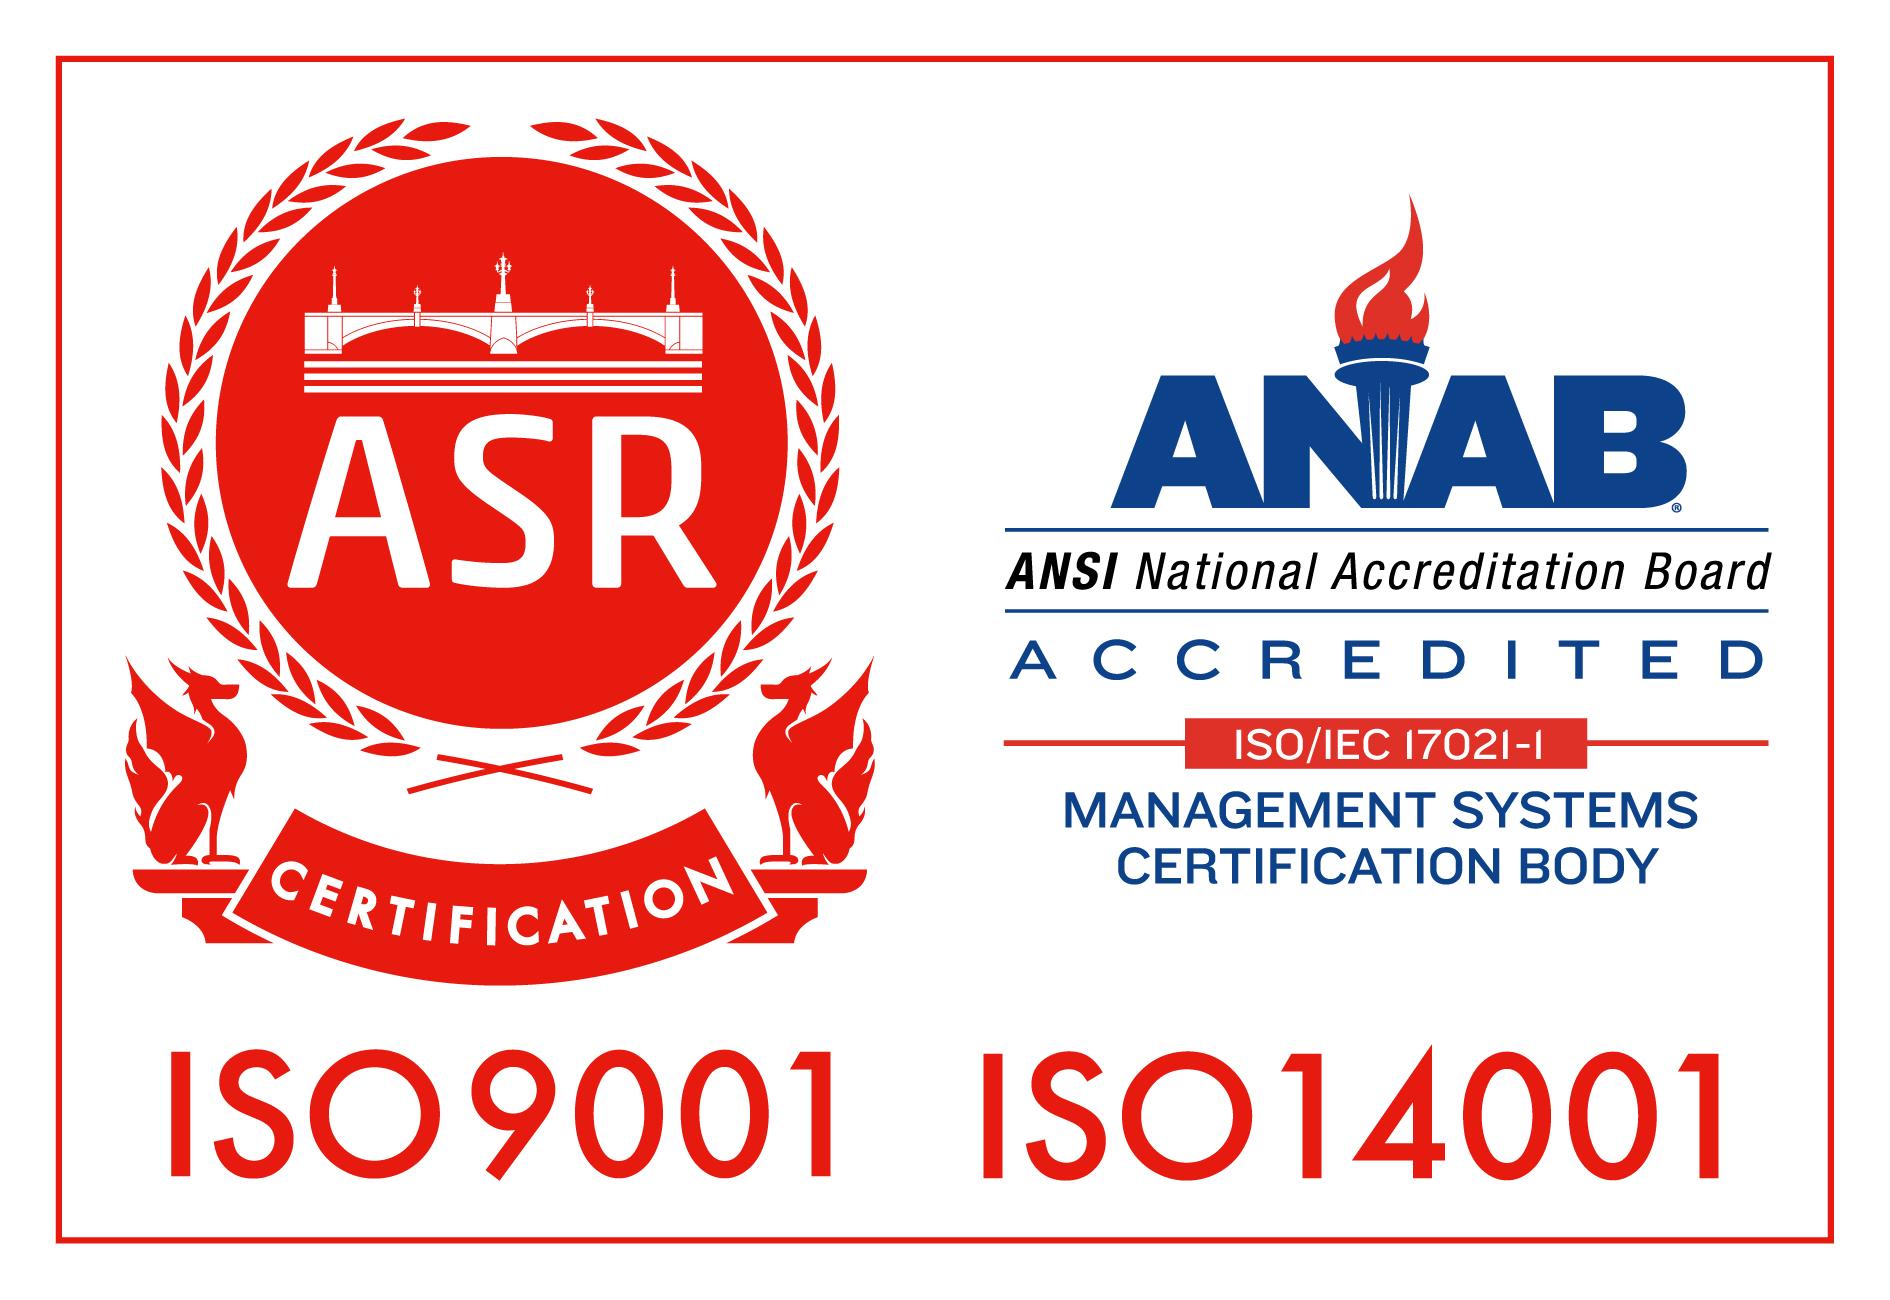 ASR_ANAB_9001_14001_OL.jpg